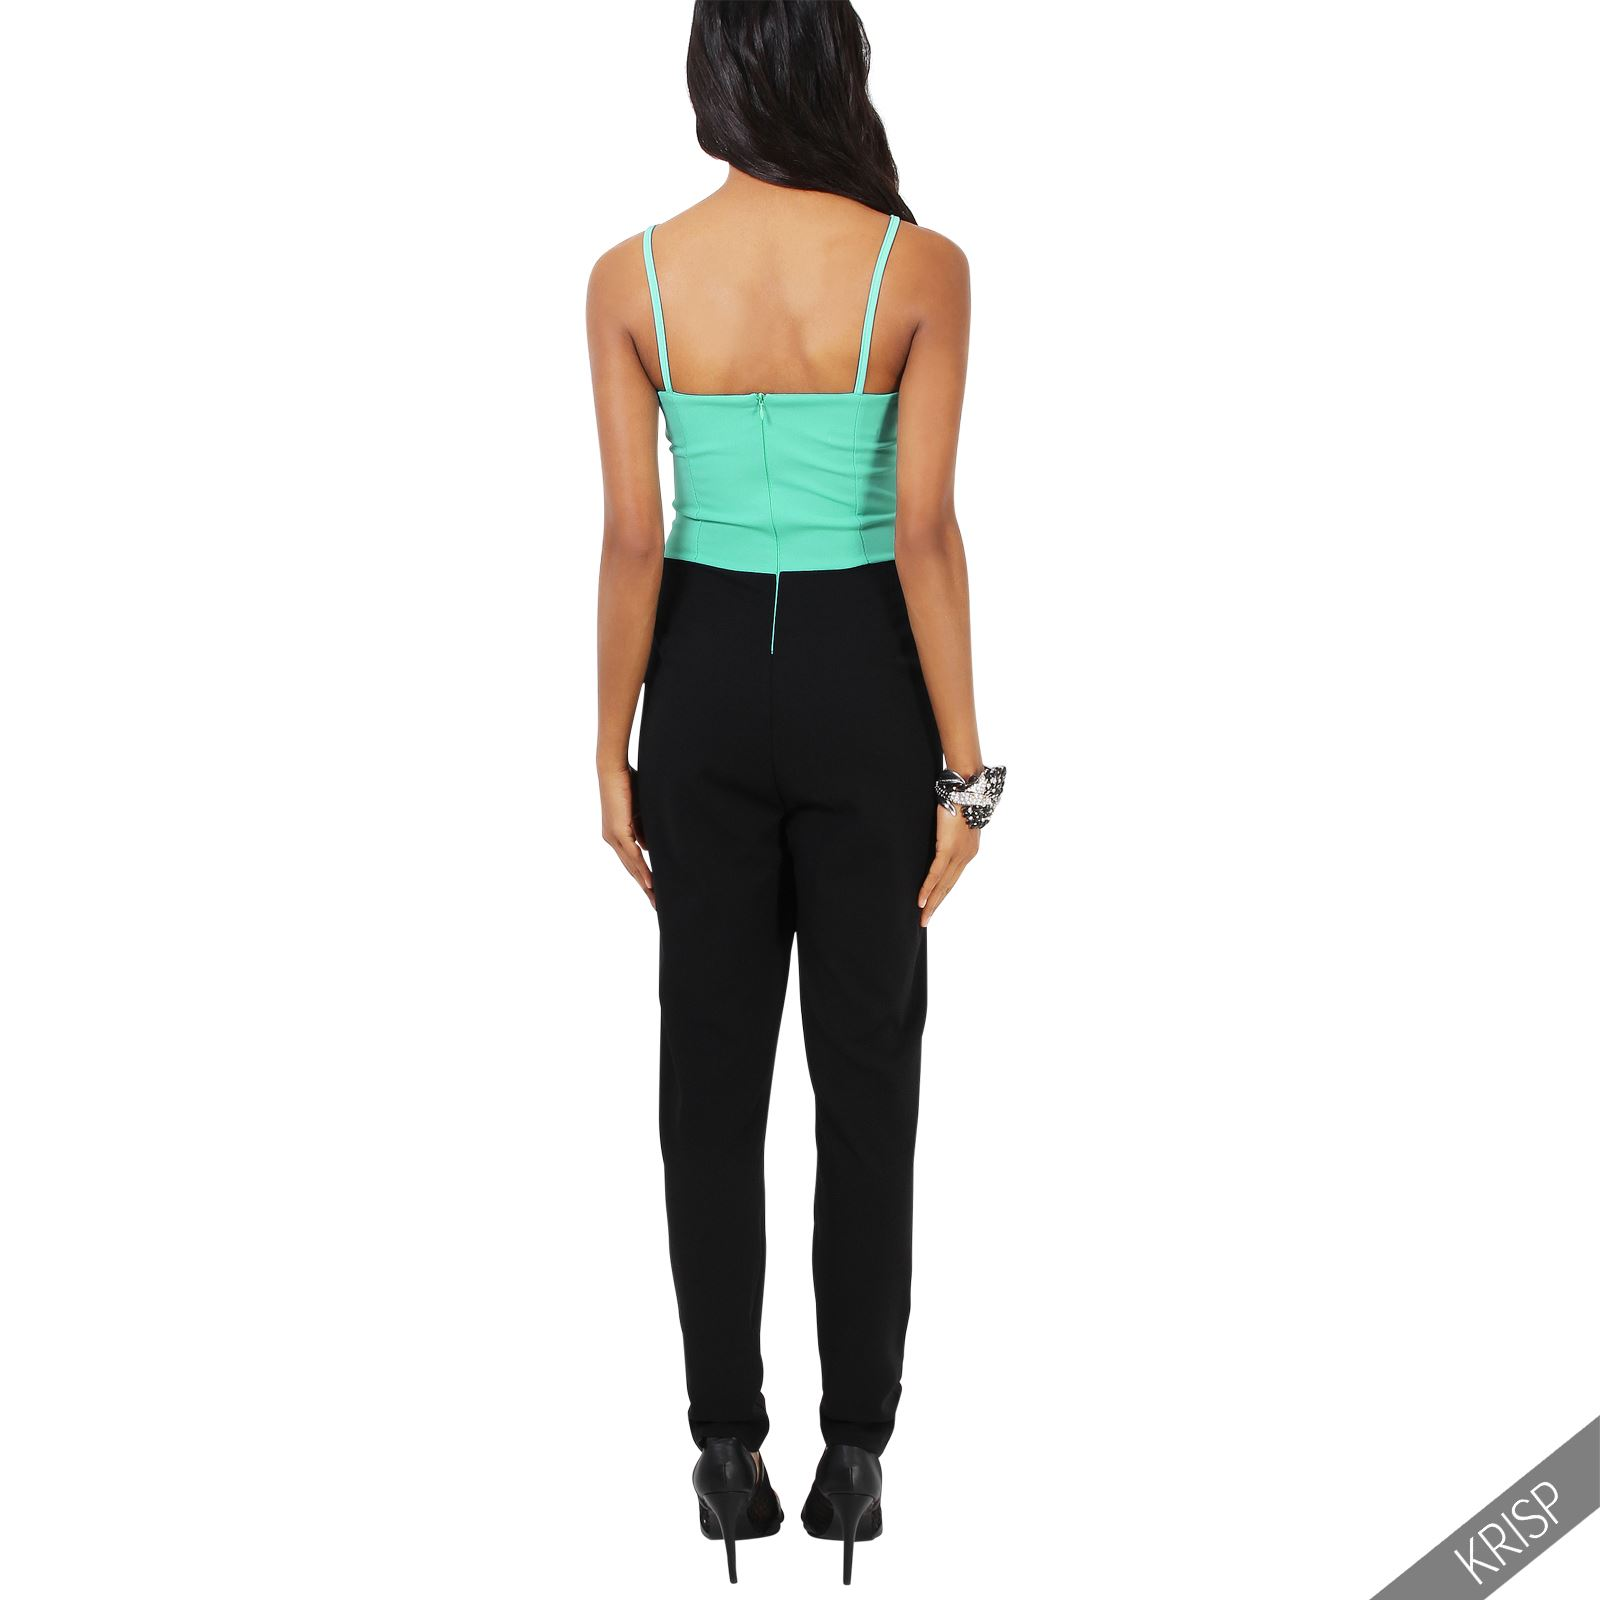 damen tr gertop jumpsuit spitze h kelspitze overall einteiler sommer party club ebay. Black Bedroom Furniture Sets. Home Design Ideas